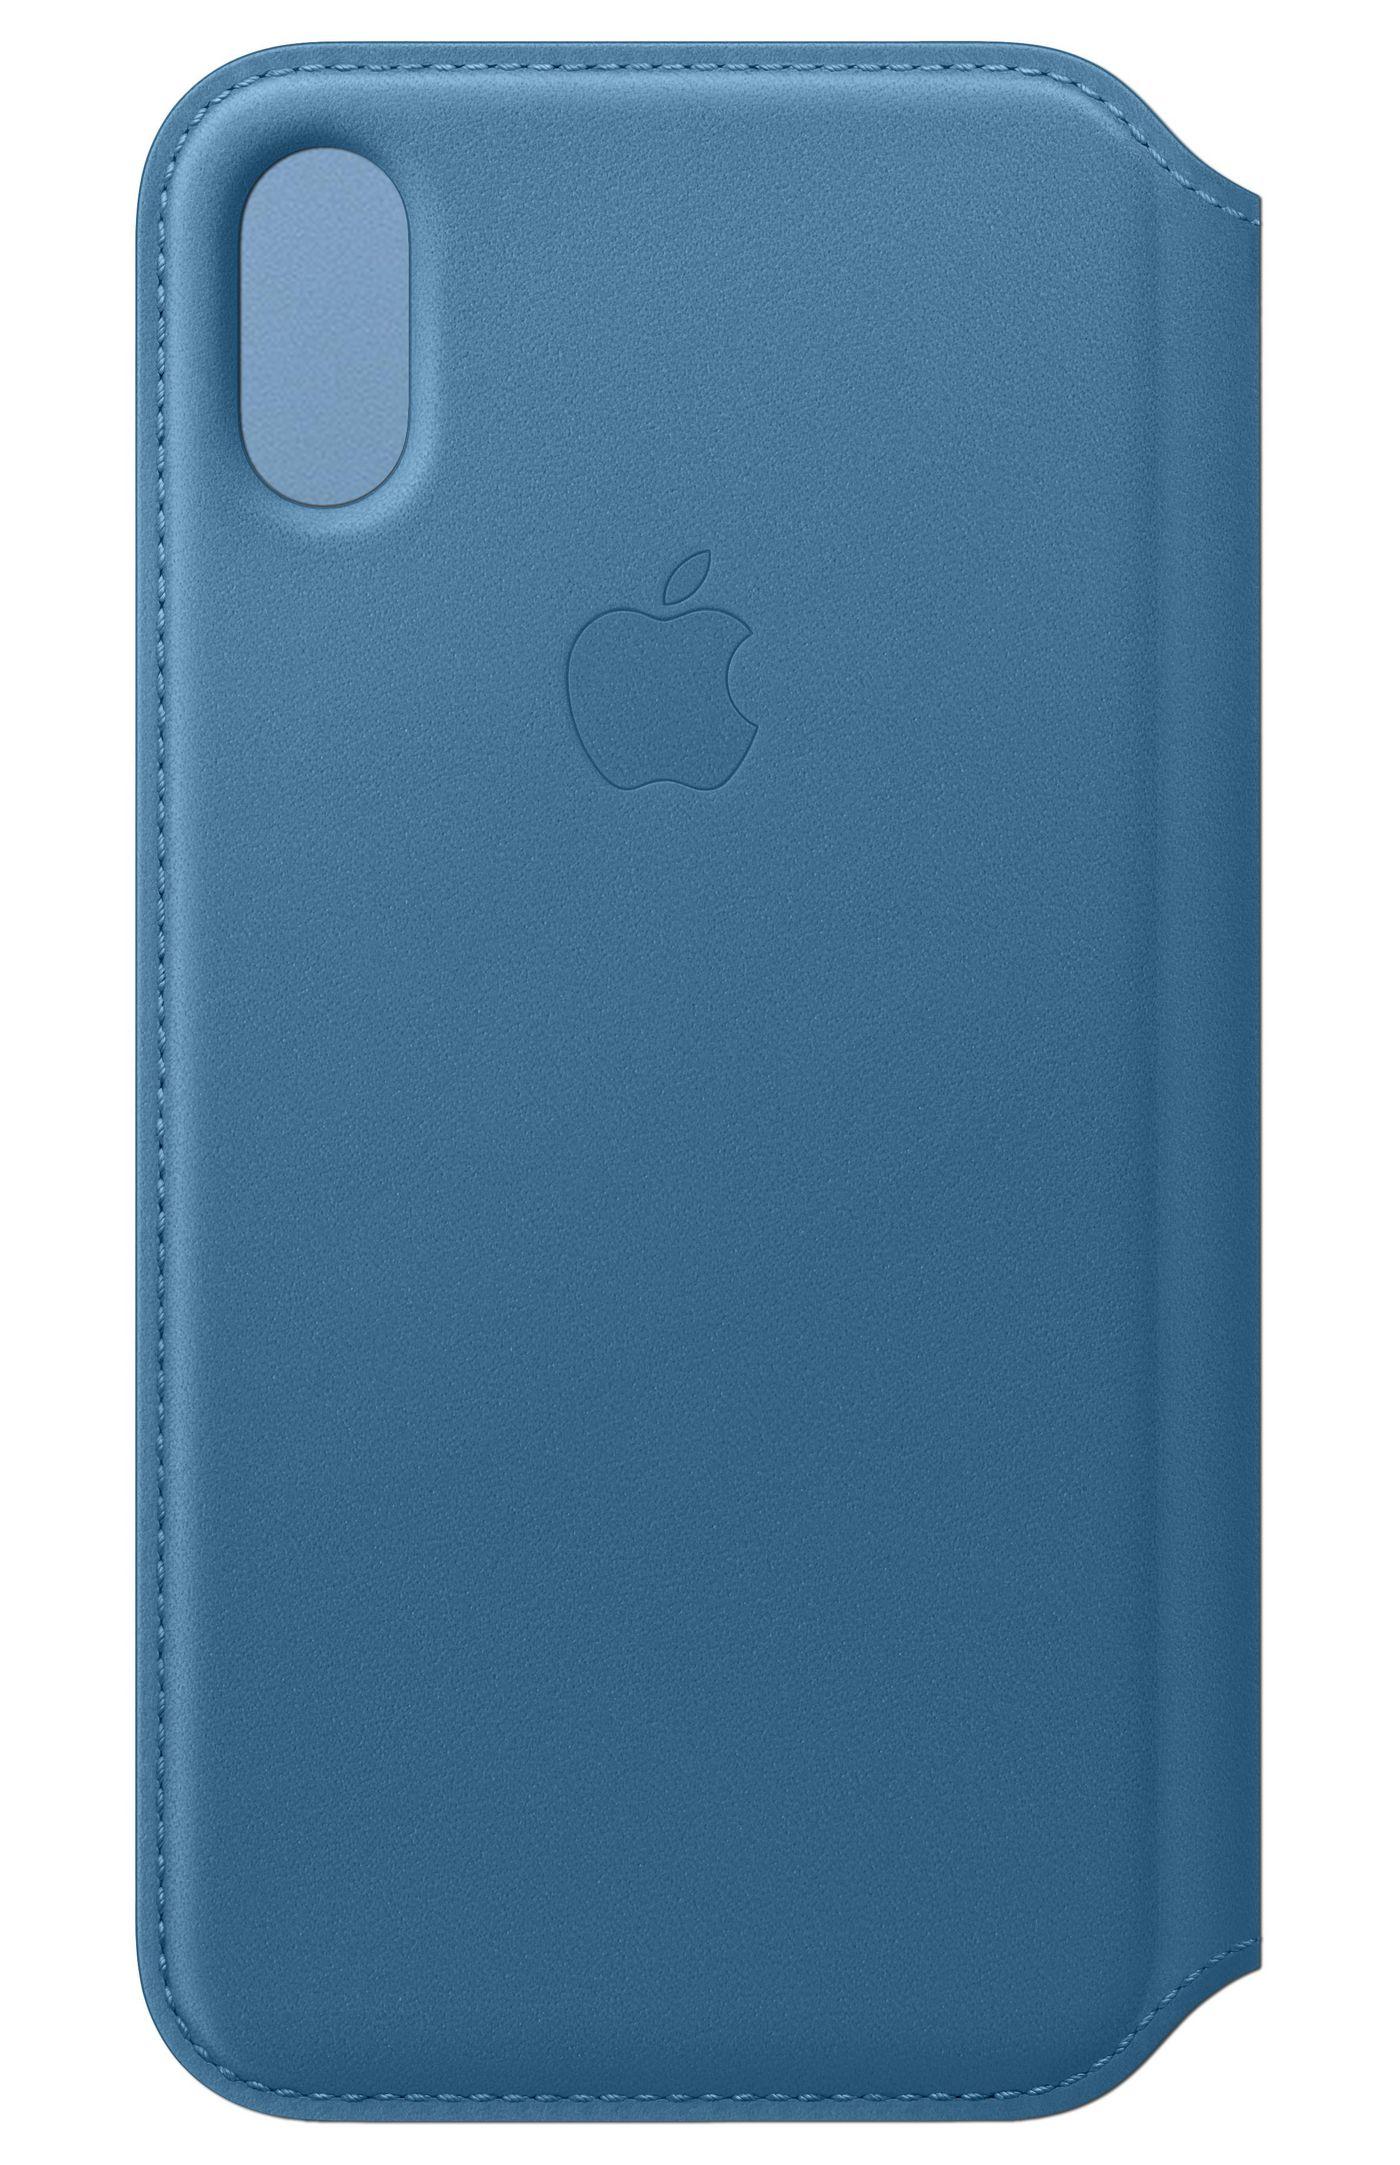 Apple MRX02ZMA MRX02ZM/A iPhone XSleather Folio Cape